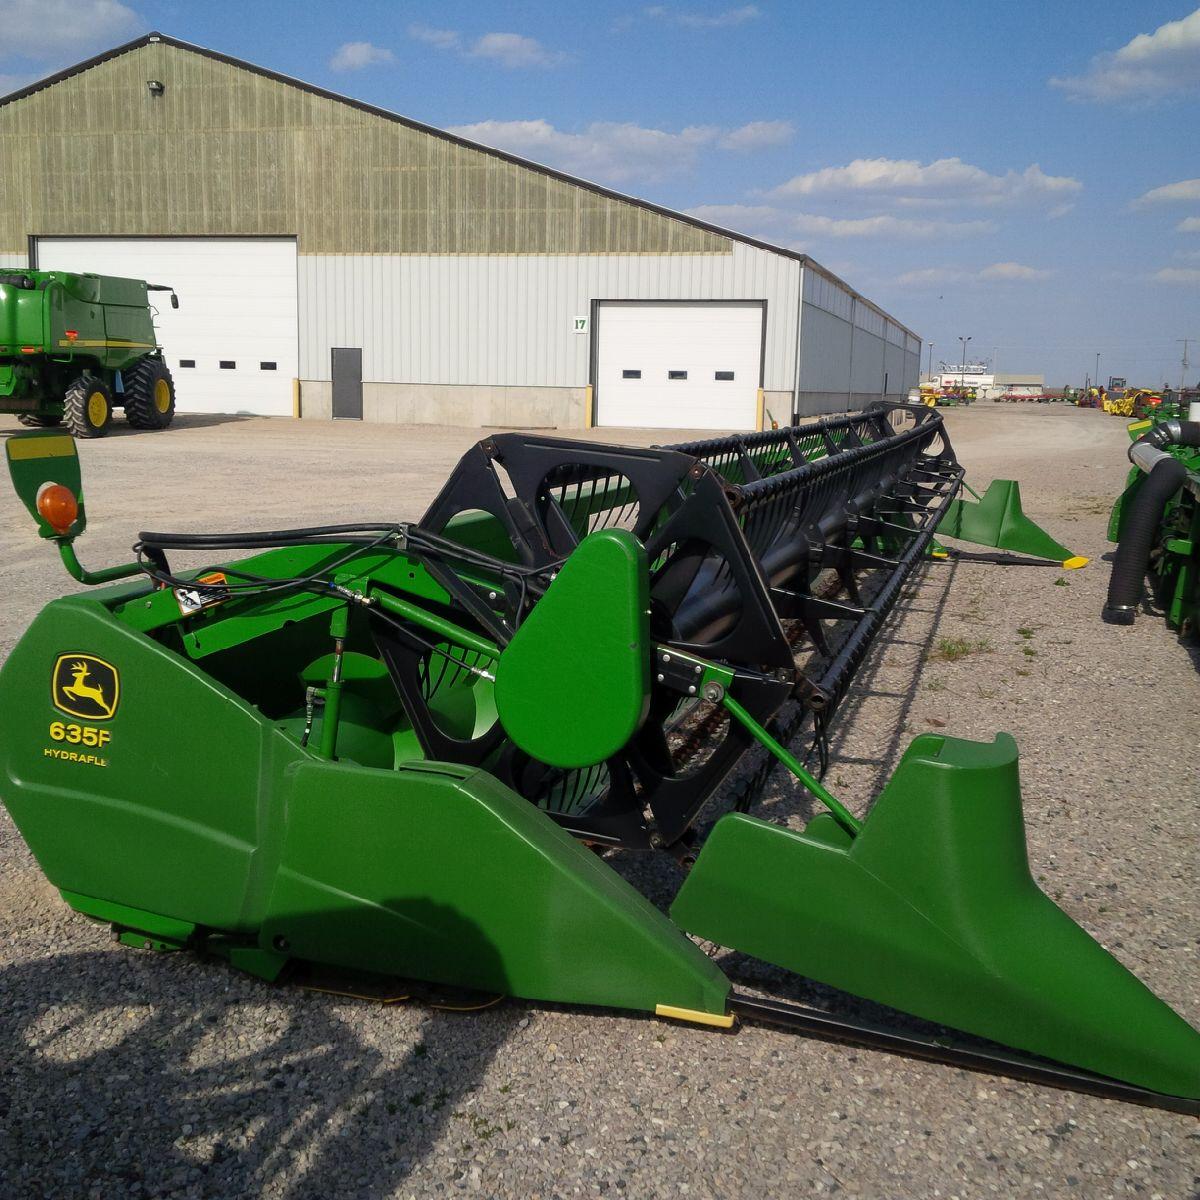 JD 635F (E74047) – $16,900.00